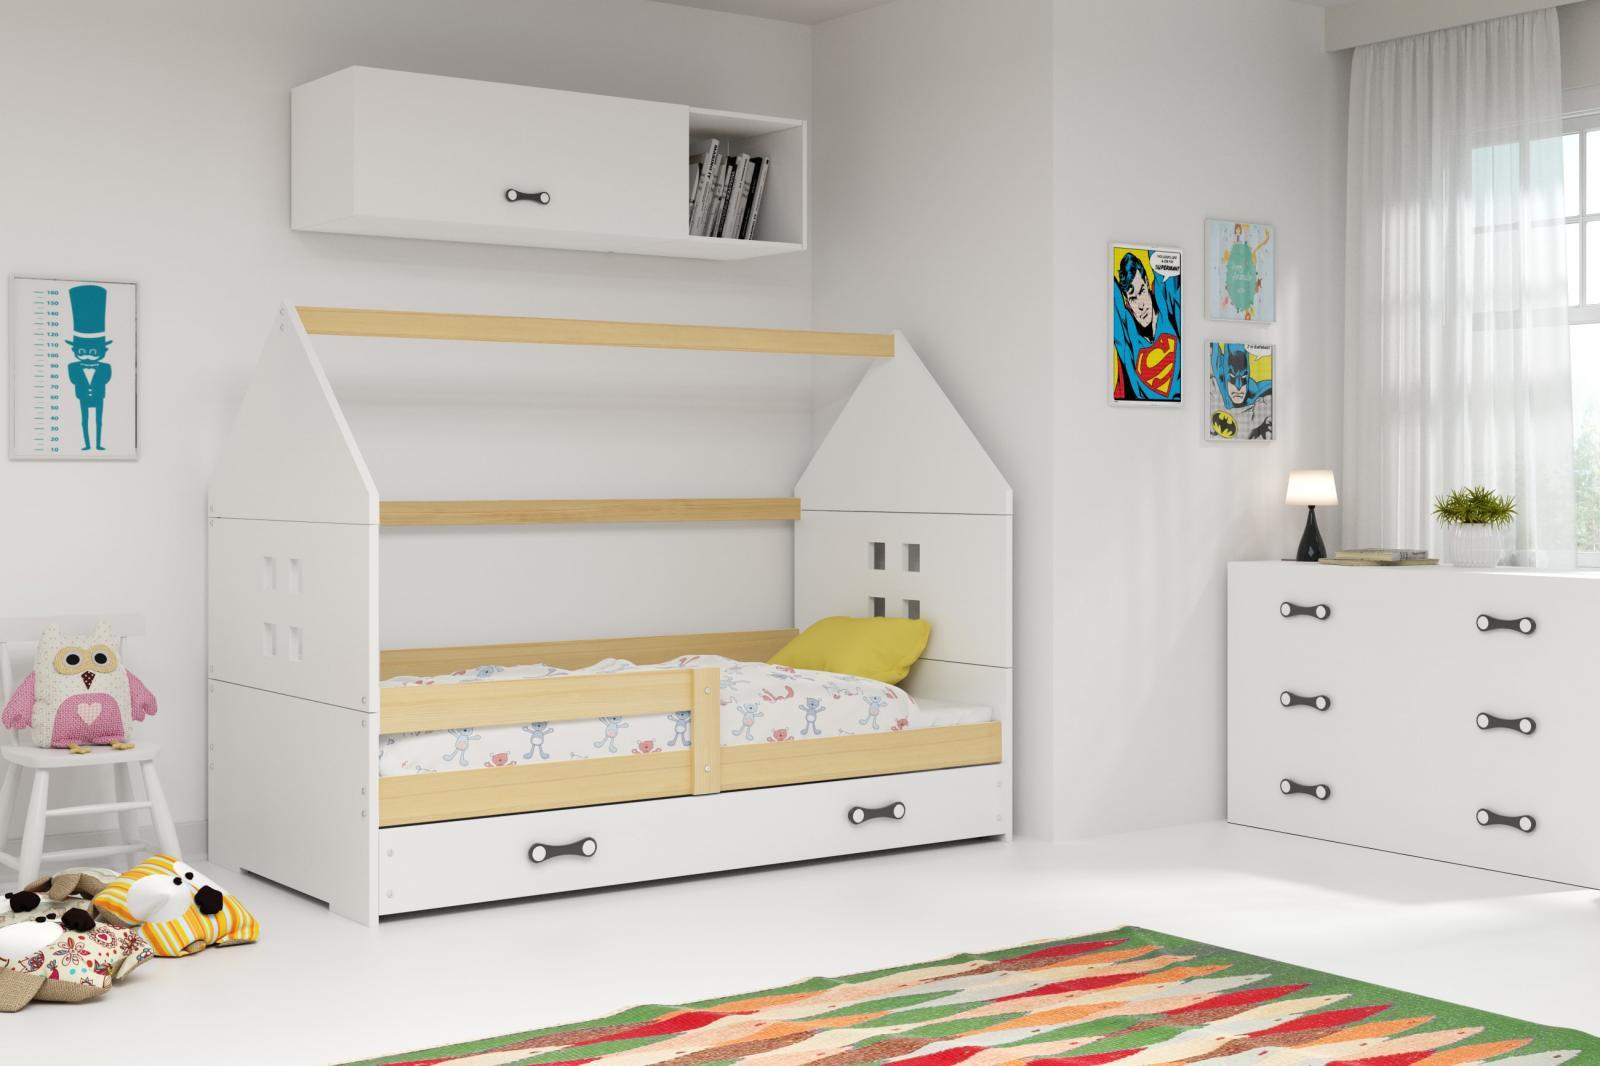 Dětská postel Dominik 80x160 borovice/bílá